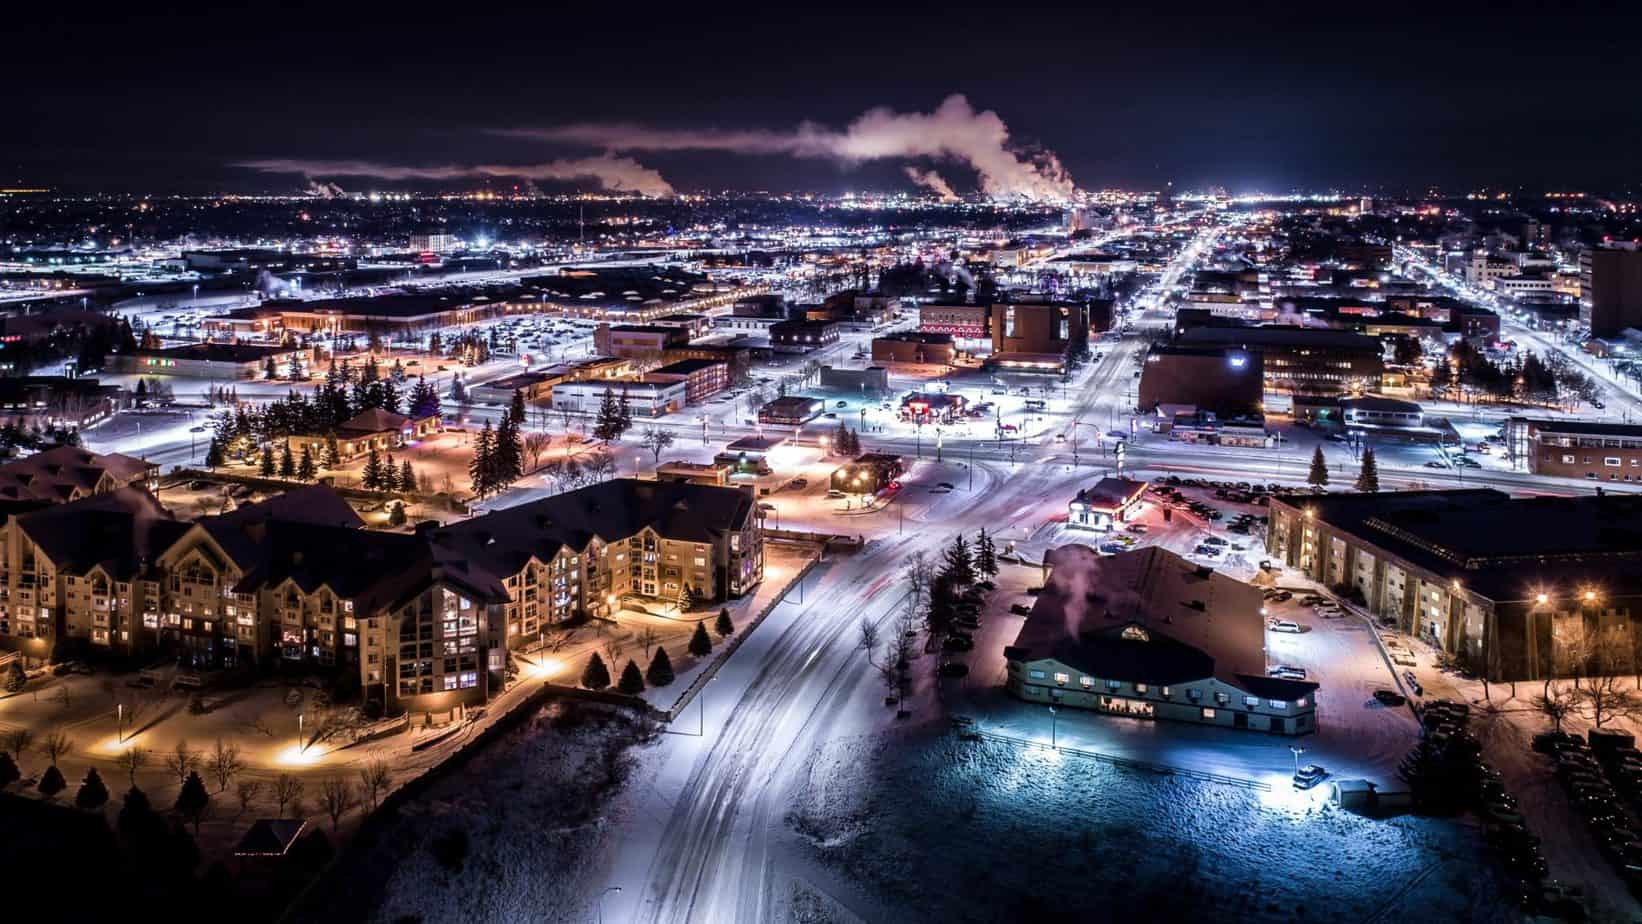 Lethbridge by Night